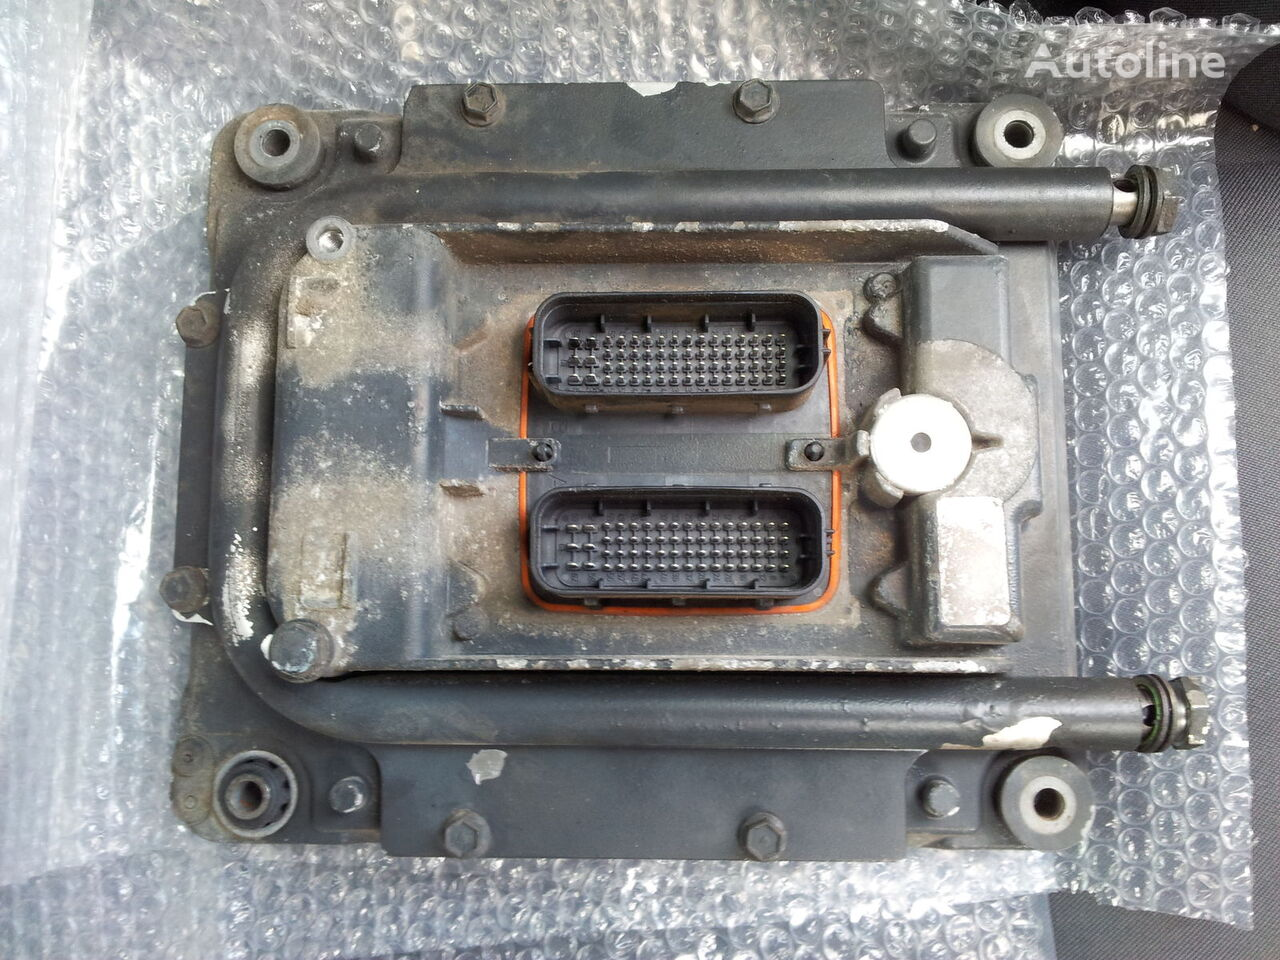 RENAULT  Magnum DXI ECU tır için Renault Magnum DXI, engine control unit, EDC, ECU, 20977019 P03 yönetim bloğu